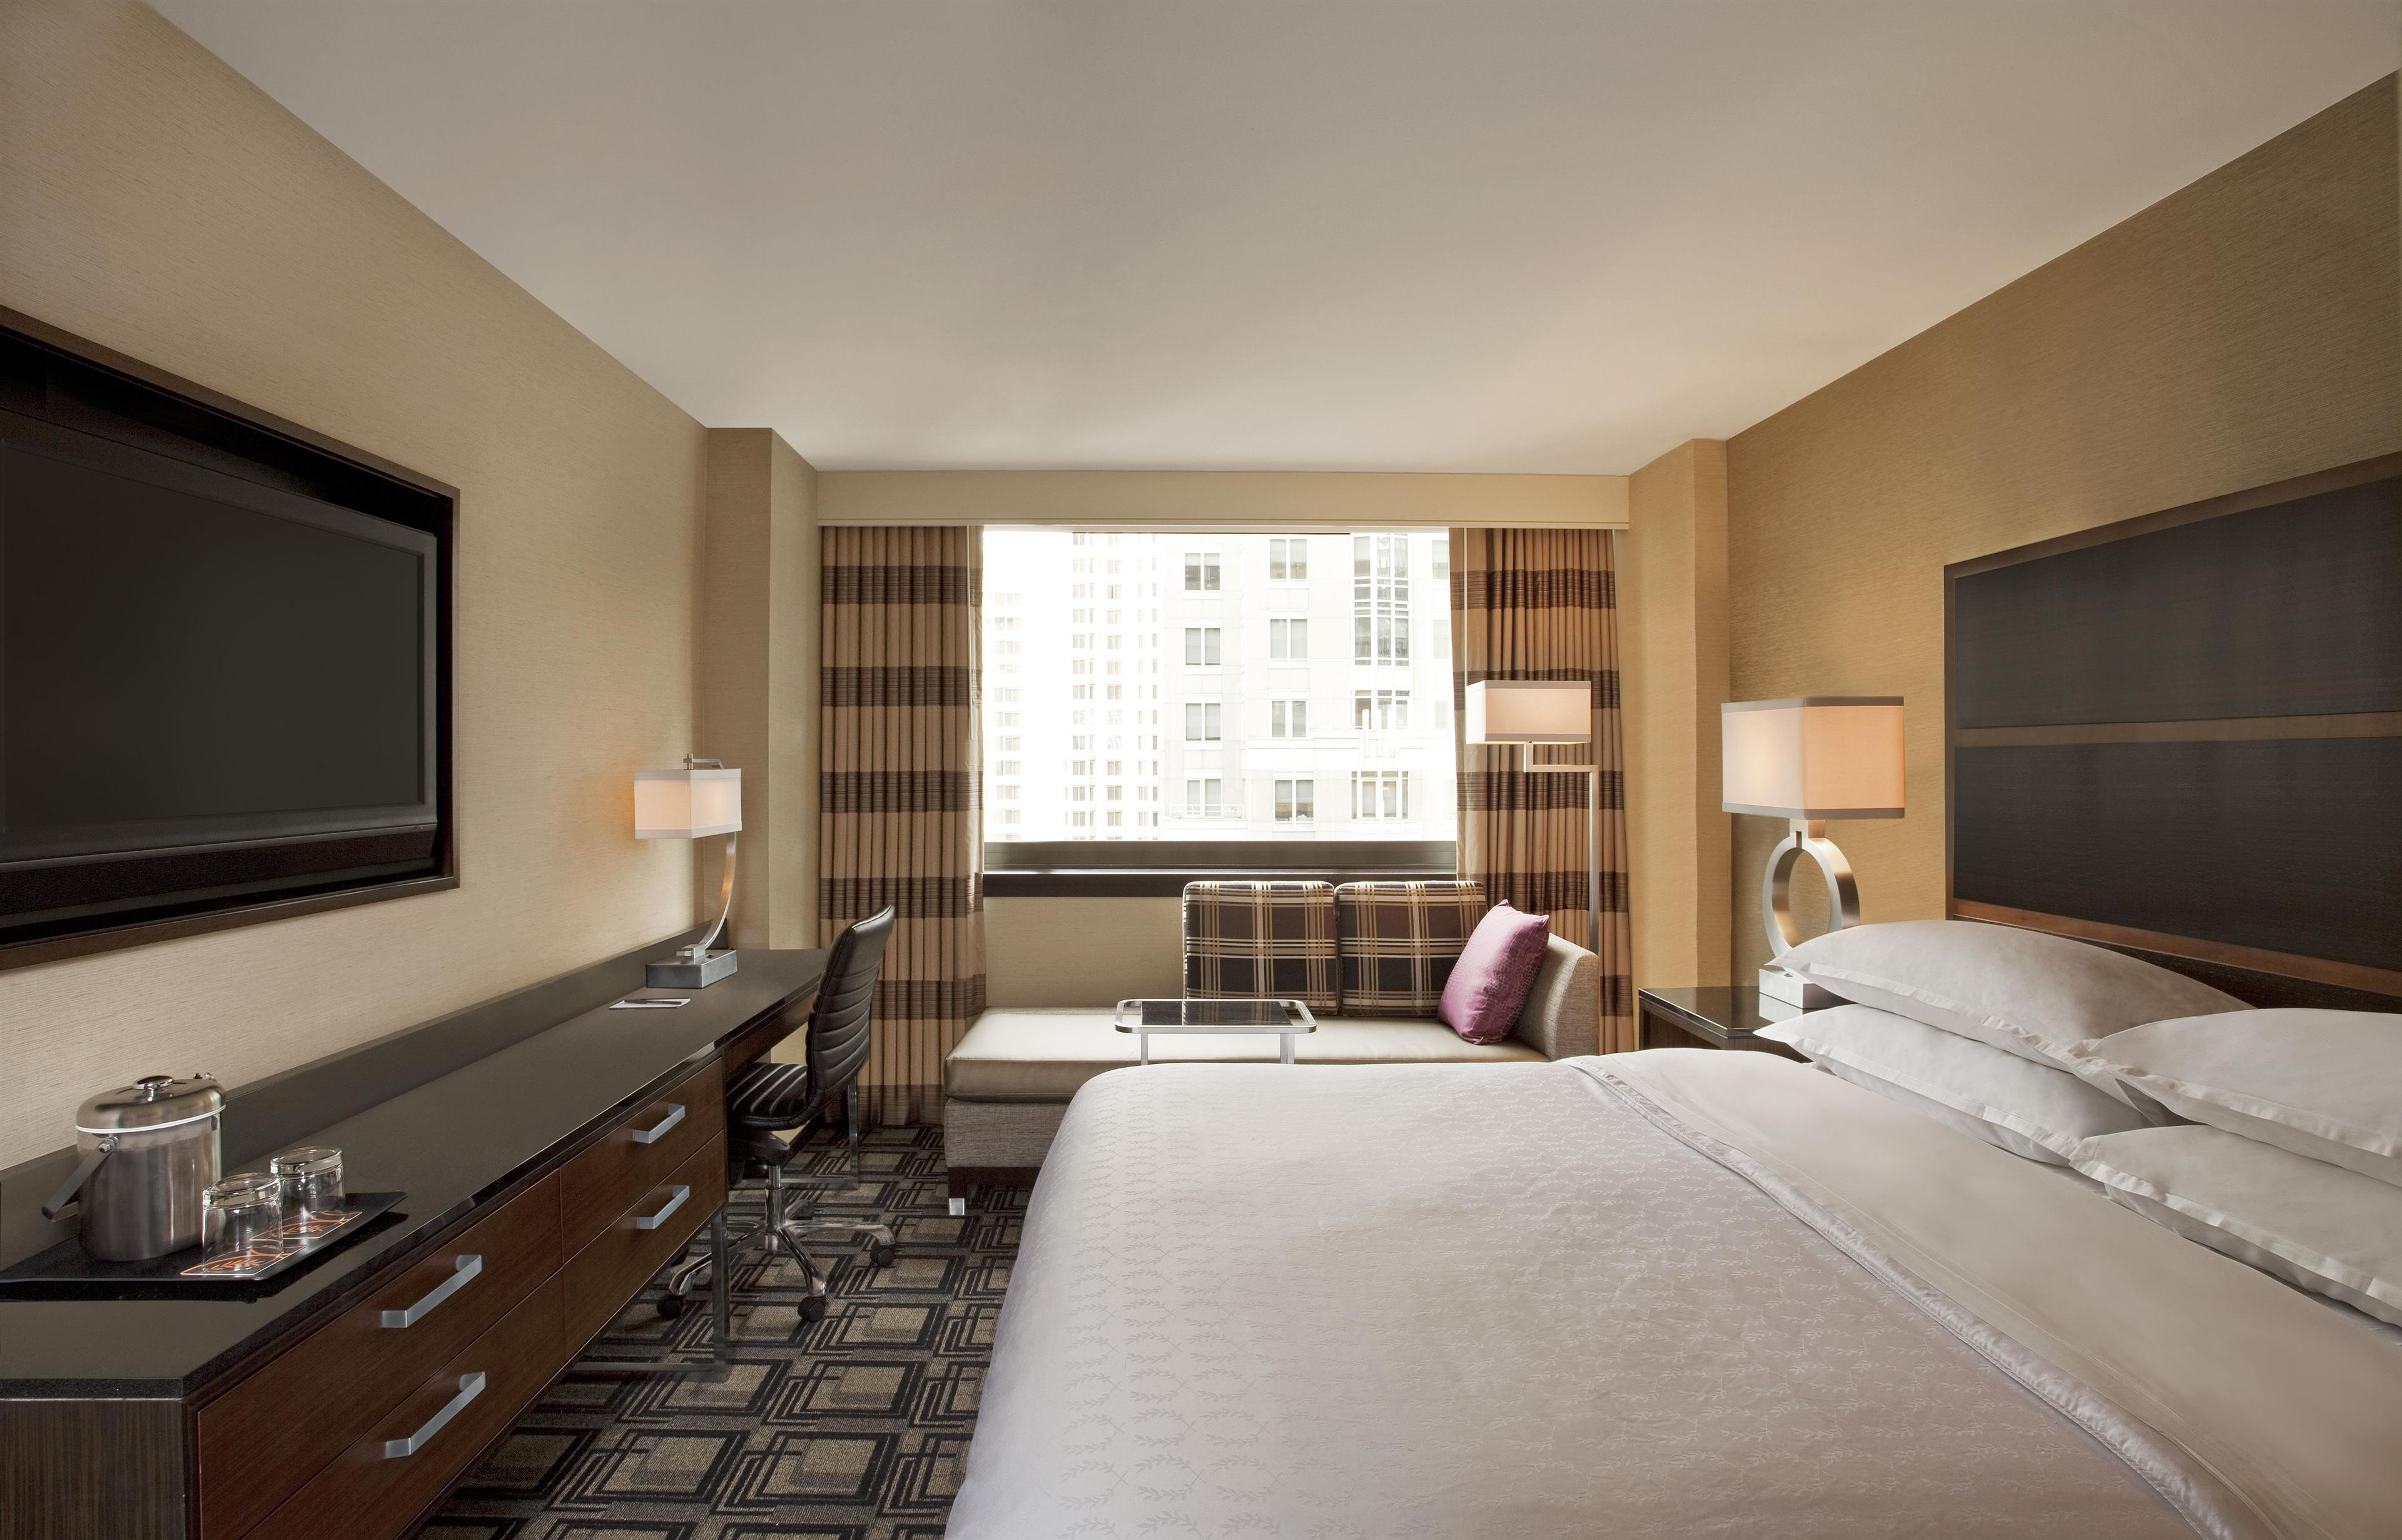 Sheraton New York Times Square Hotel image 14